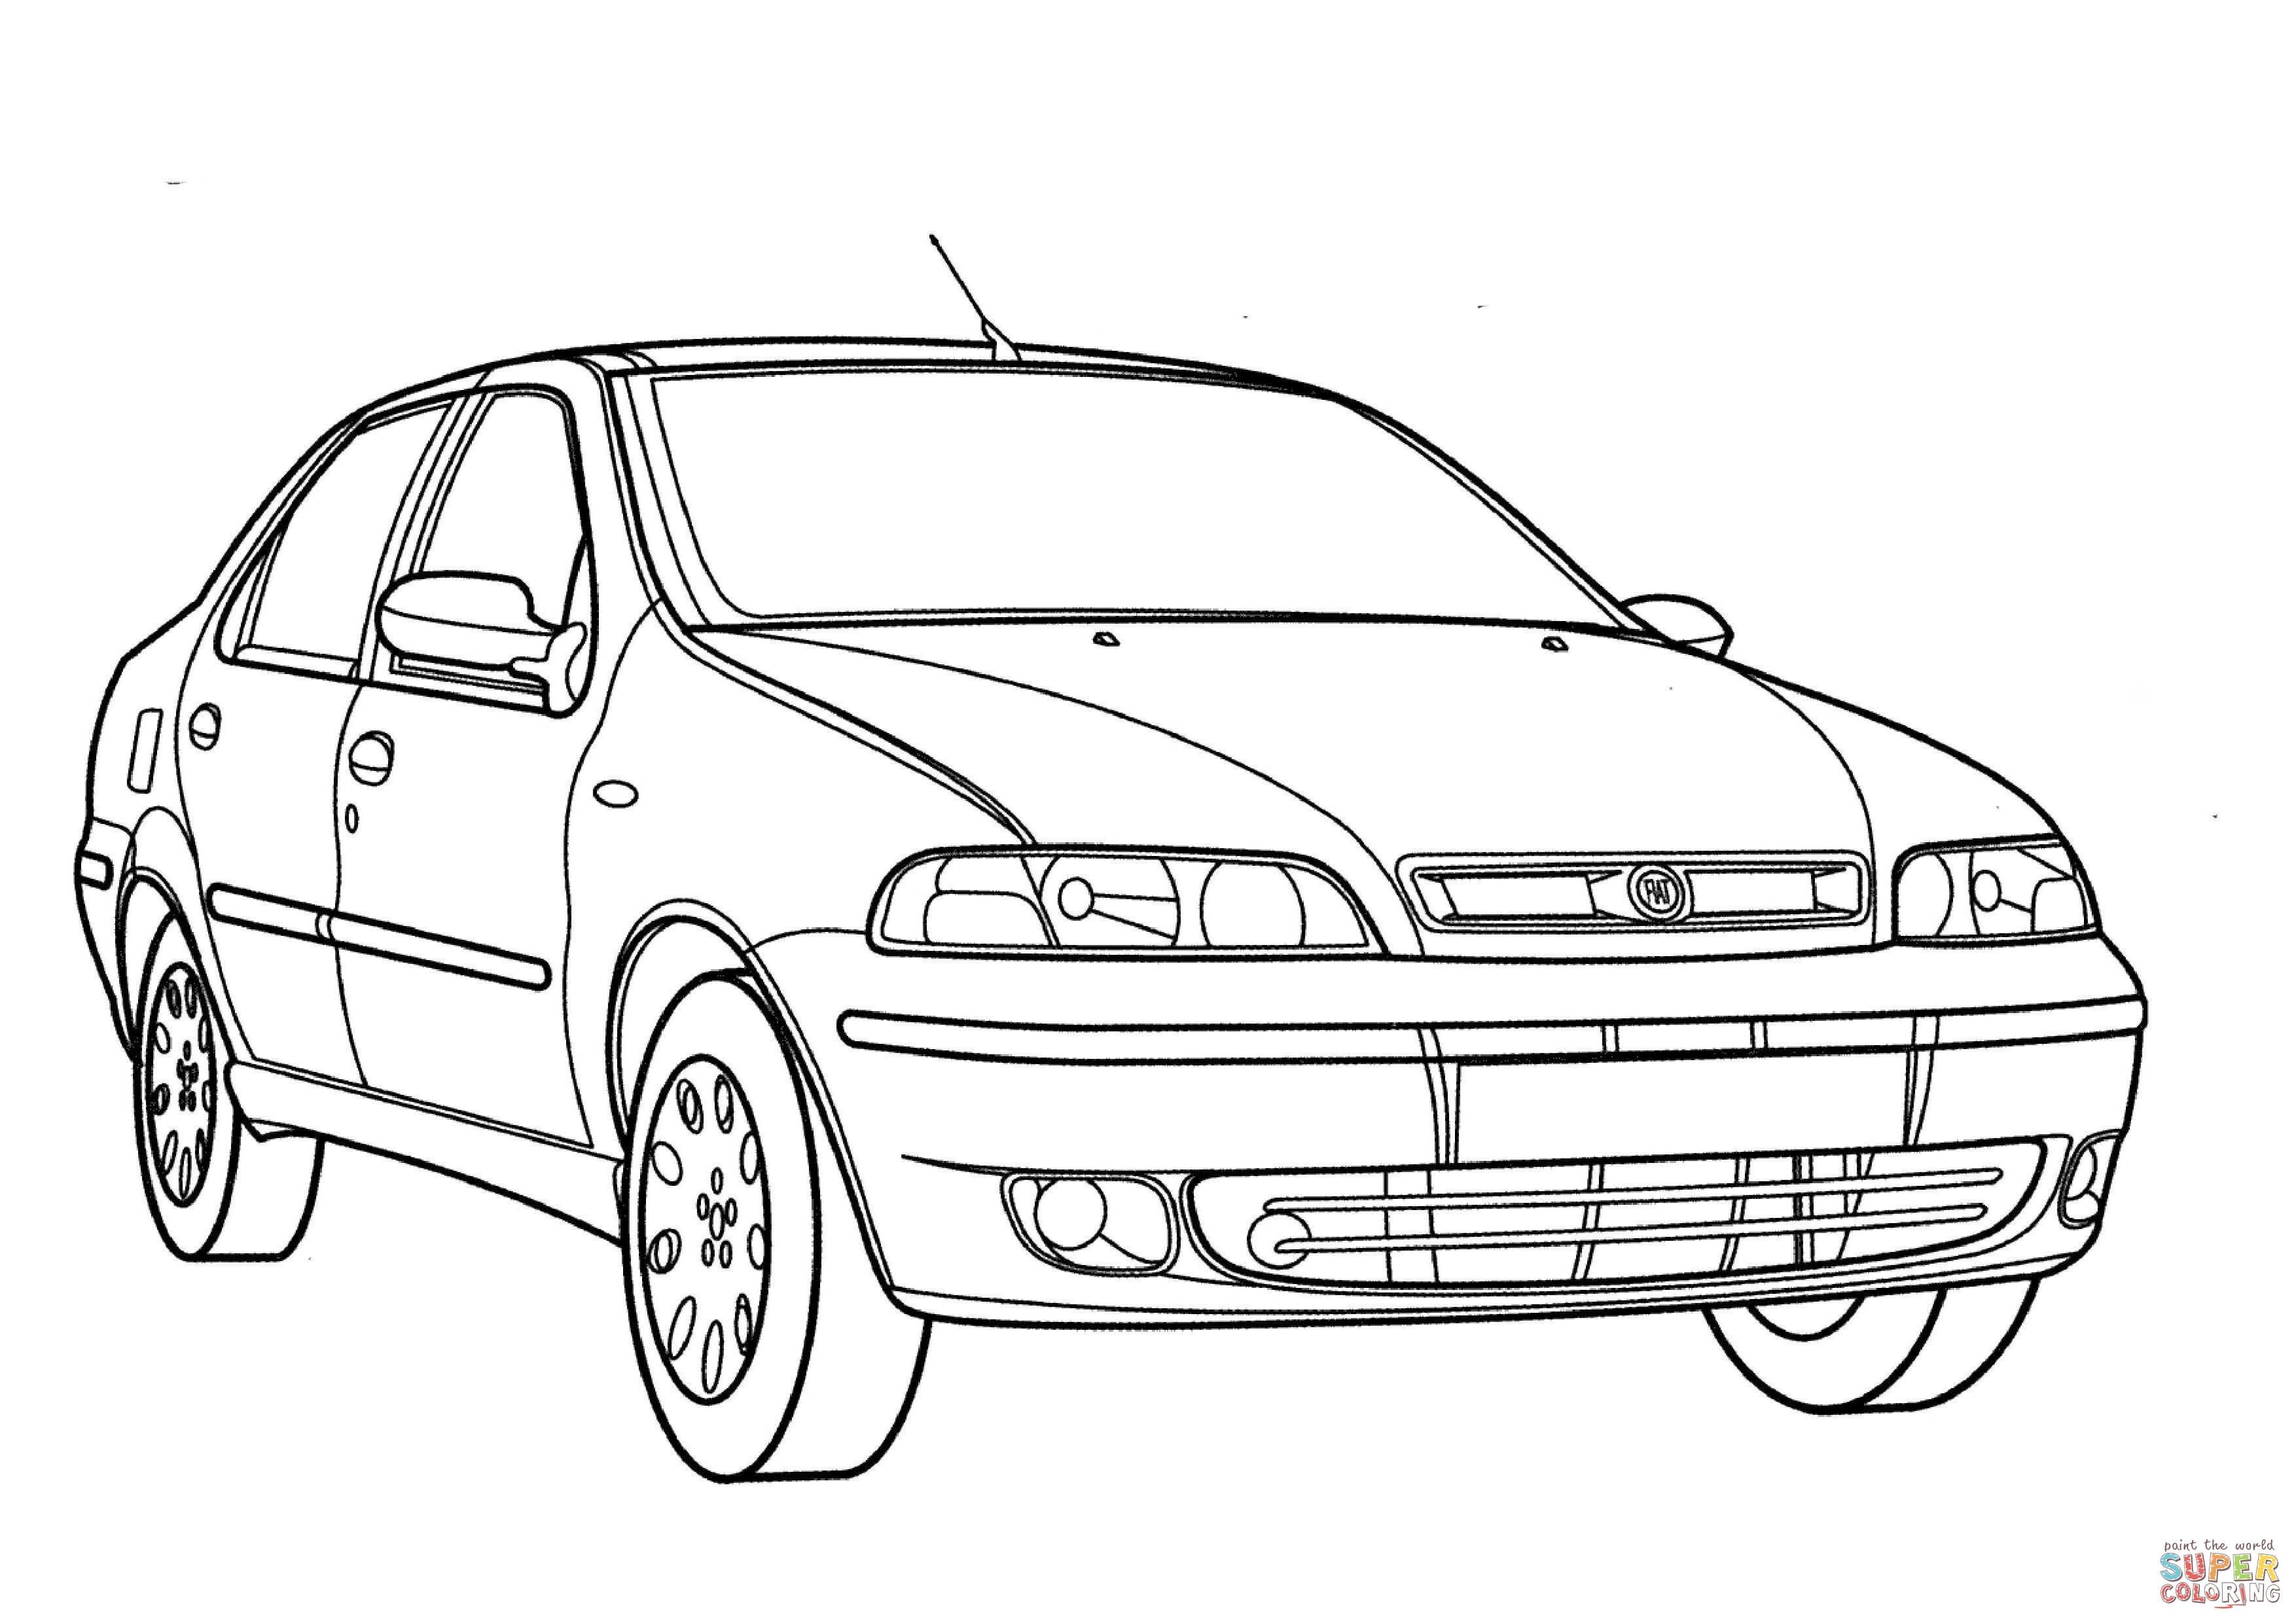 Fiat 500 Blueprint Sketch Coloring Page